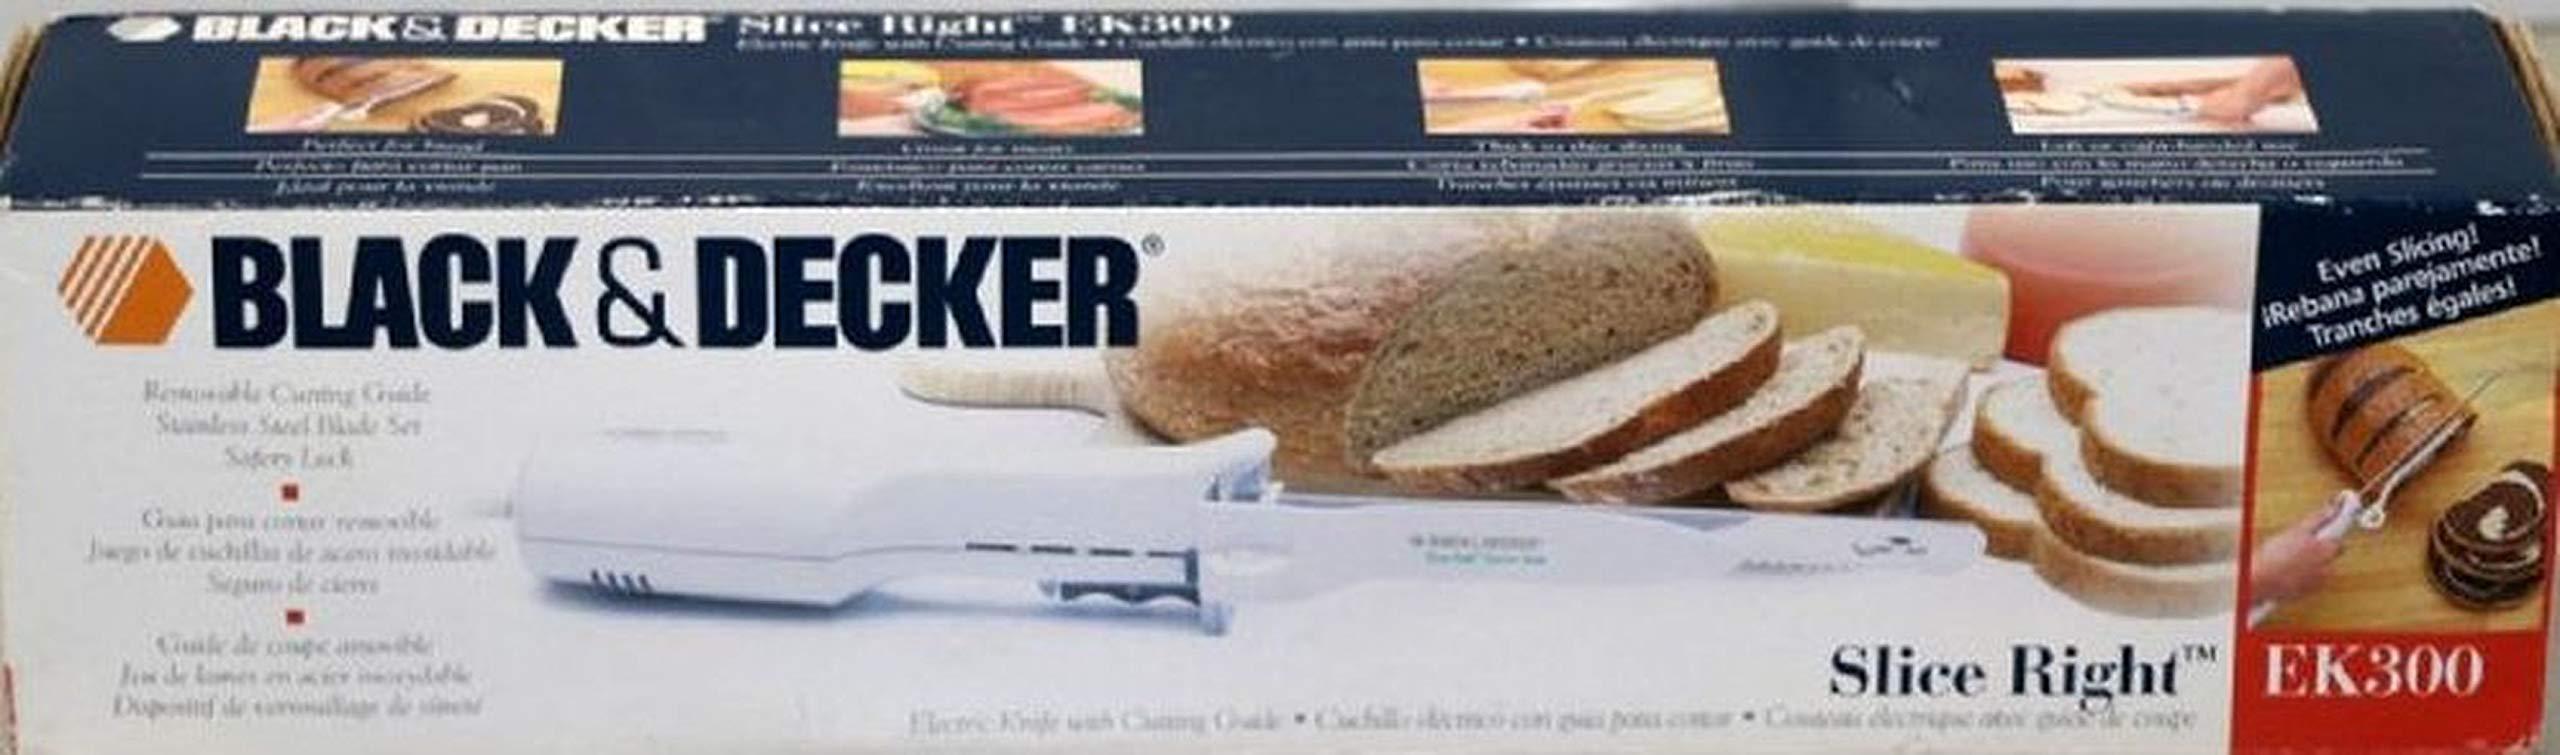 Black & Decker Electric Knife EK300 Slice Right With Box